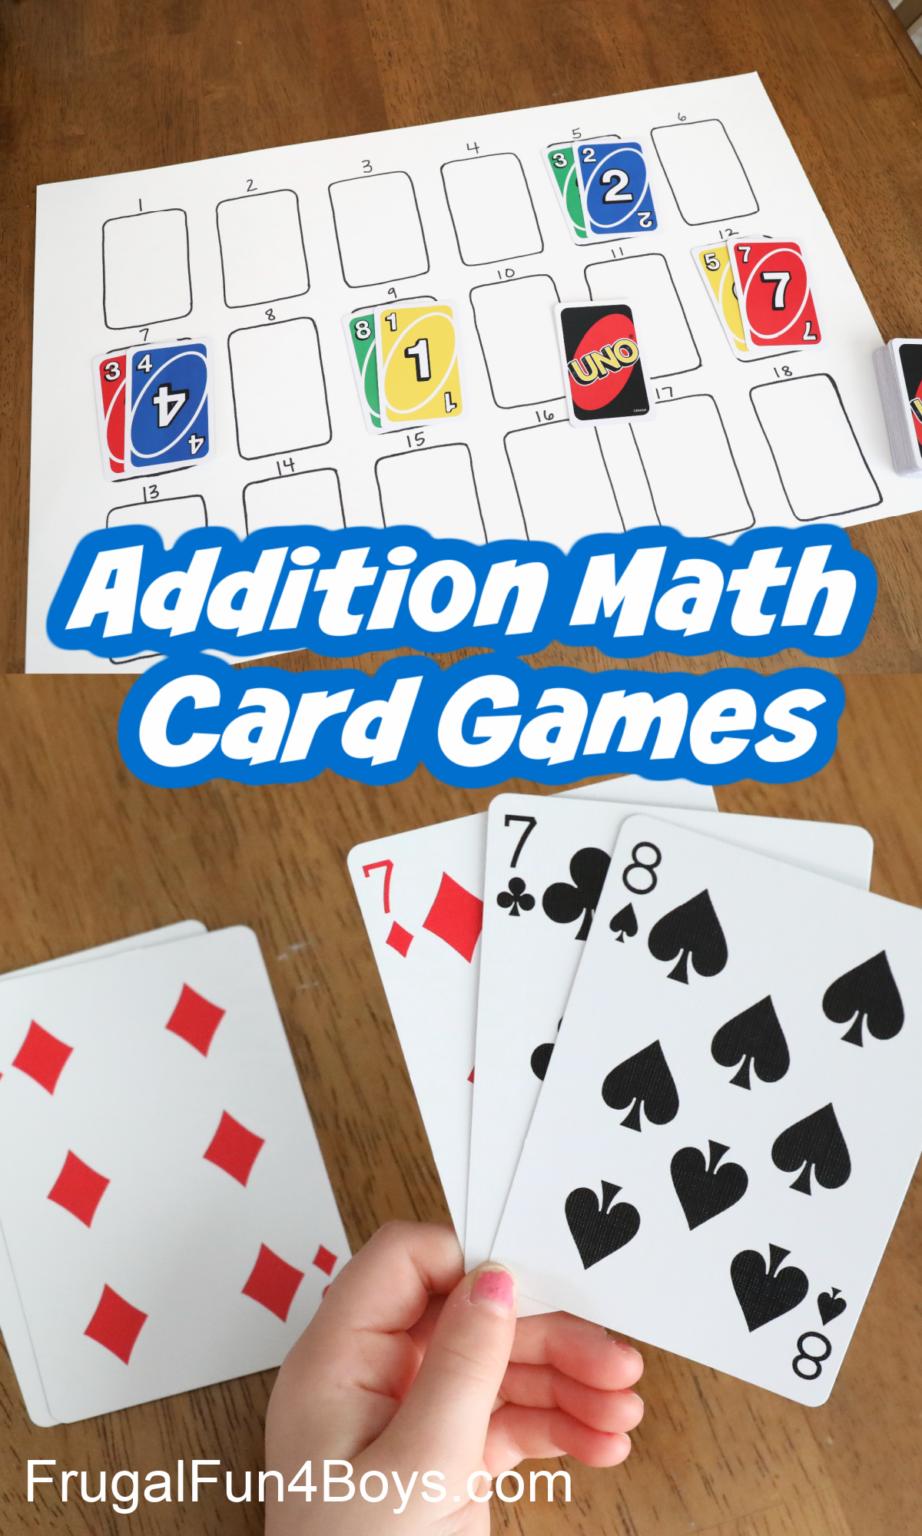 First Grade Math Games Addition Card Games Frugal Fun For Boys And Girls Math Card Games Math Addition Games Easy Math Games